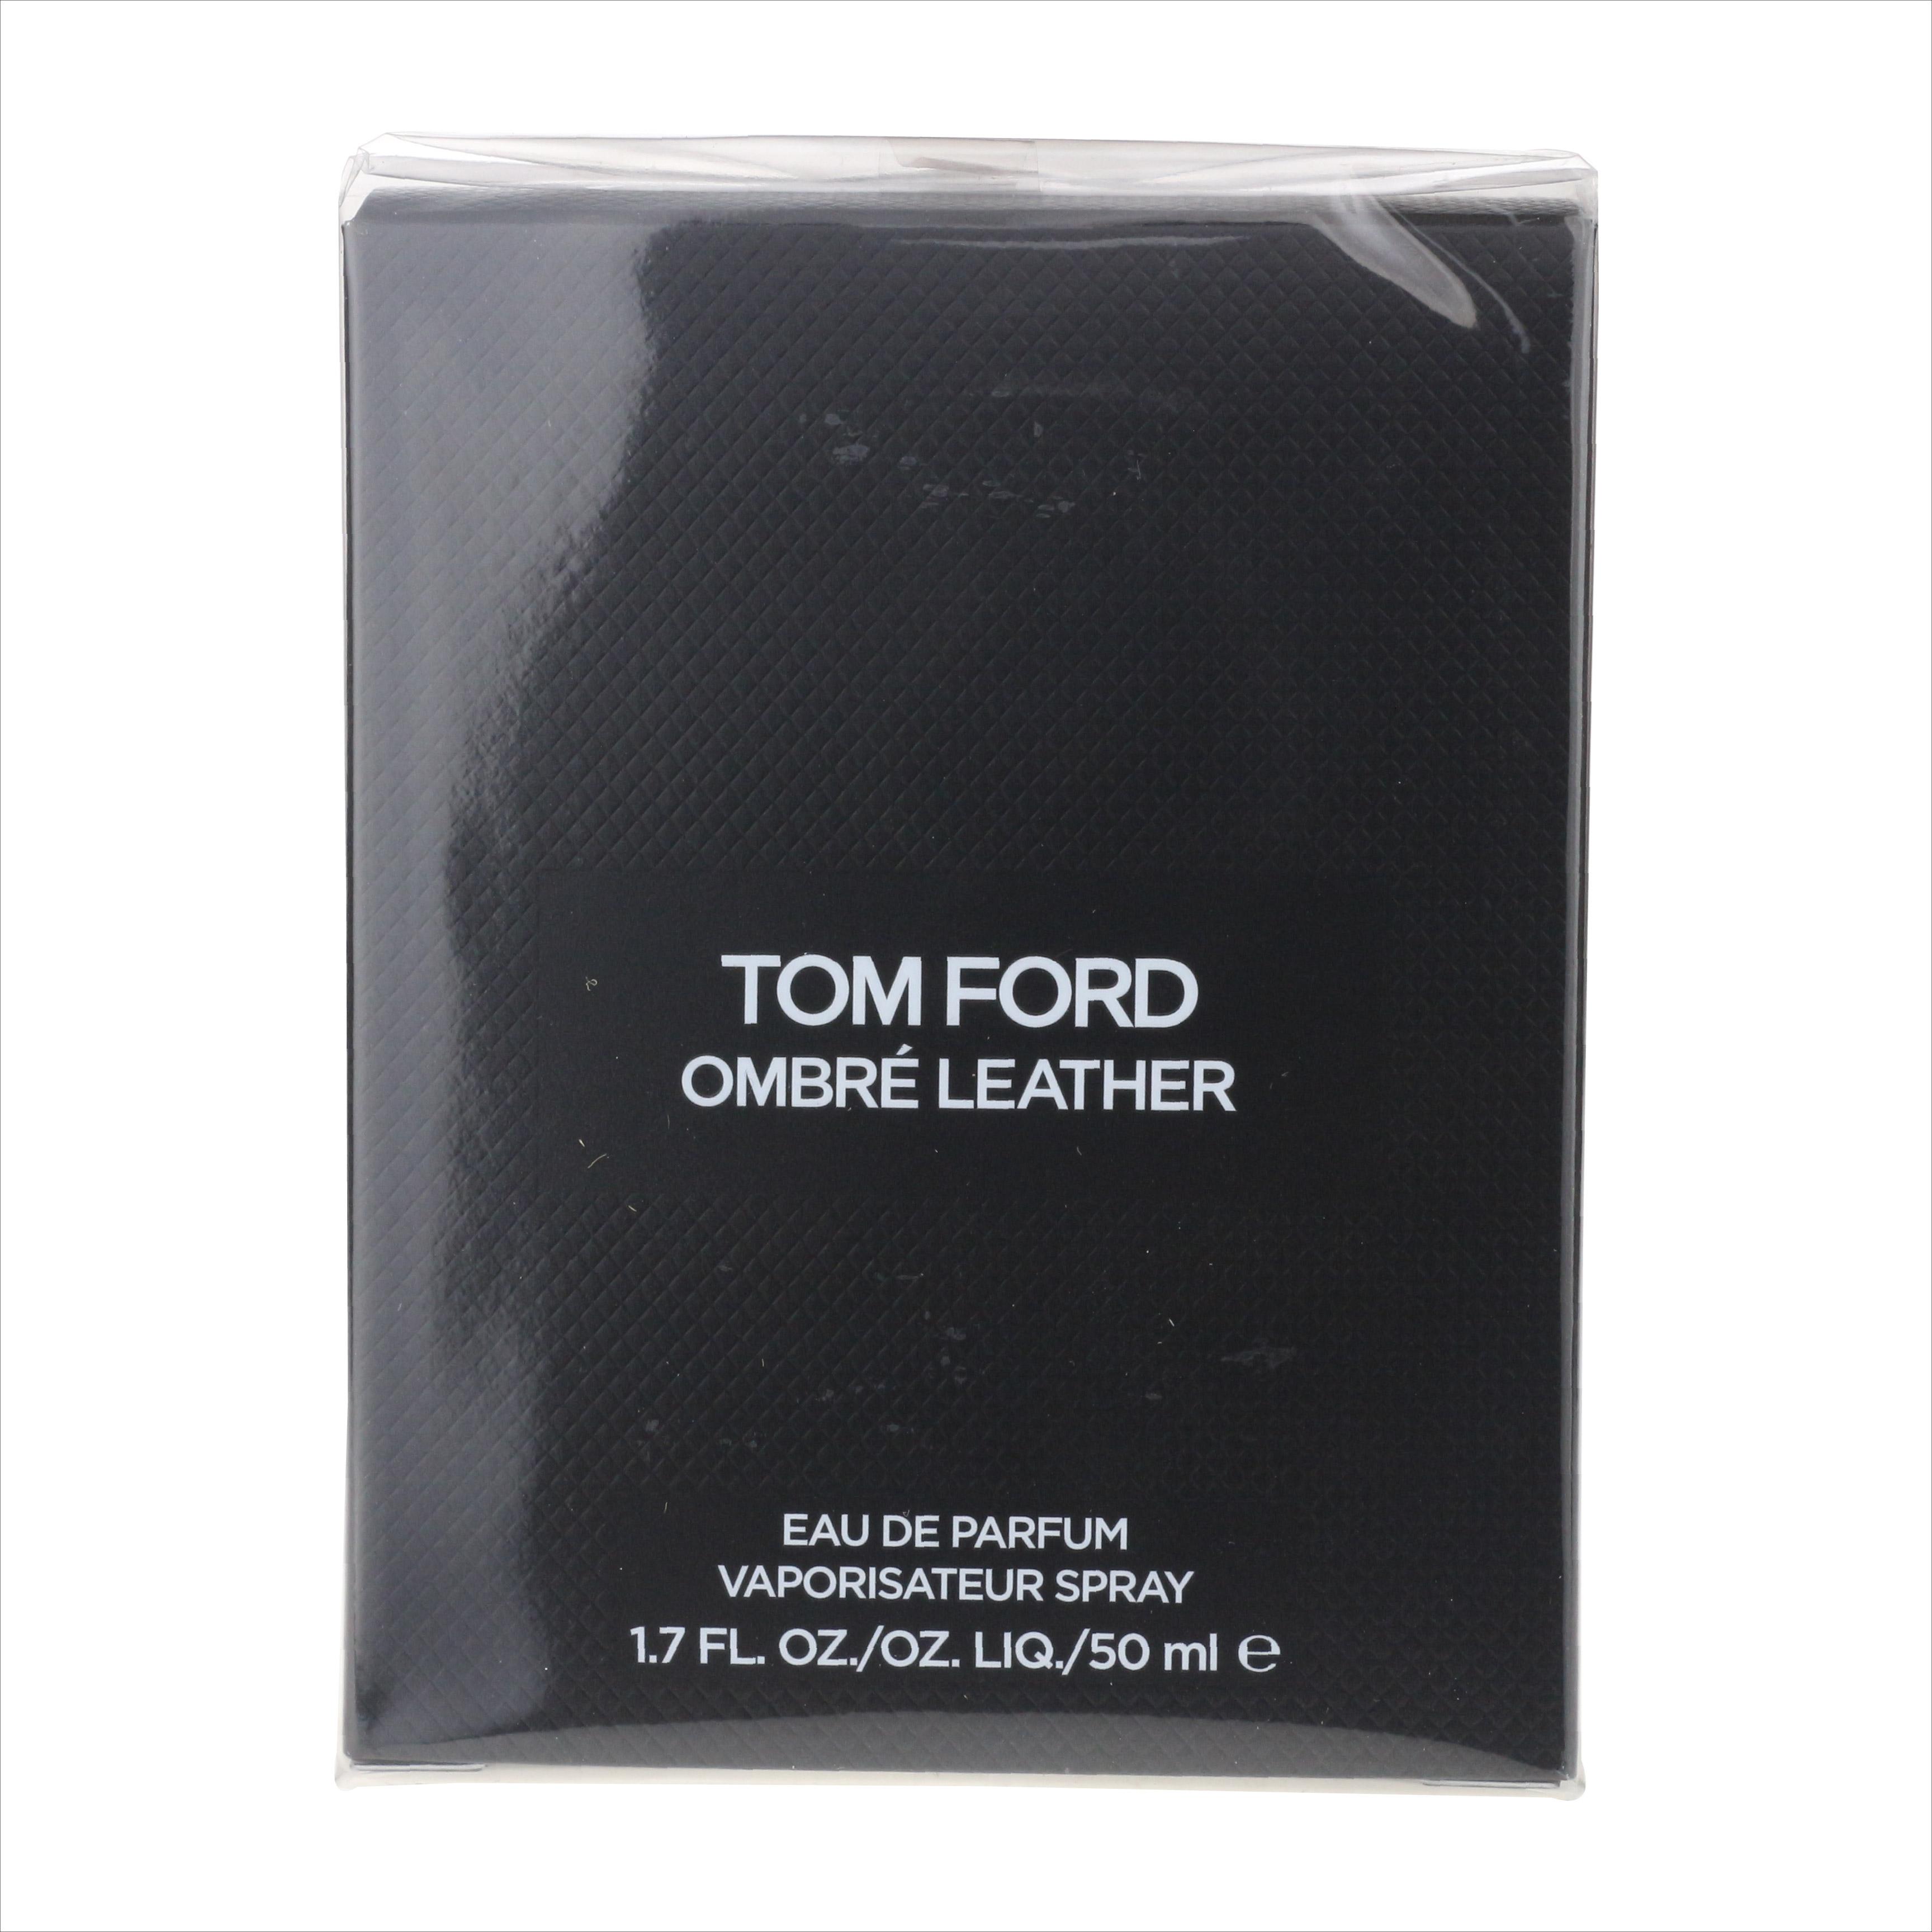 Tom Ford Ombre Leather Eau De Parfum 17oz50ml New In Box